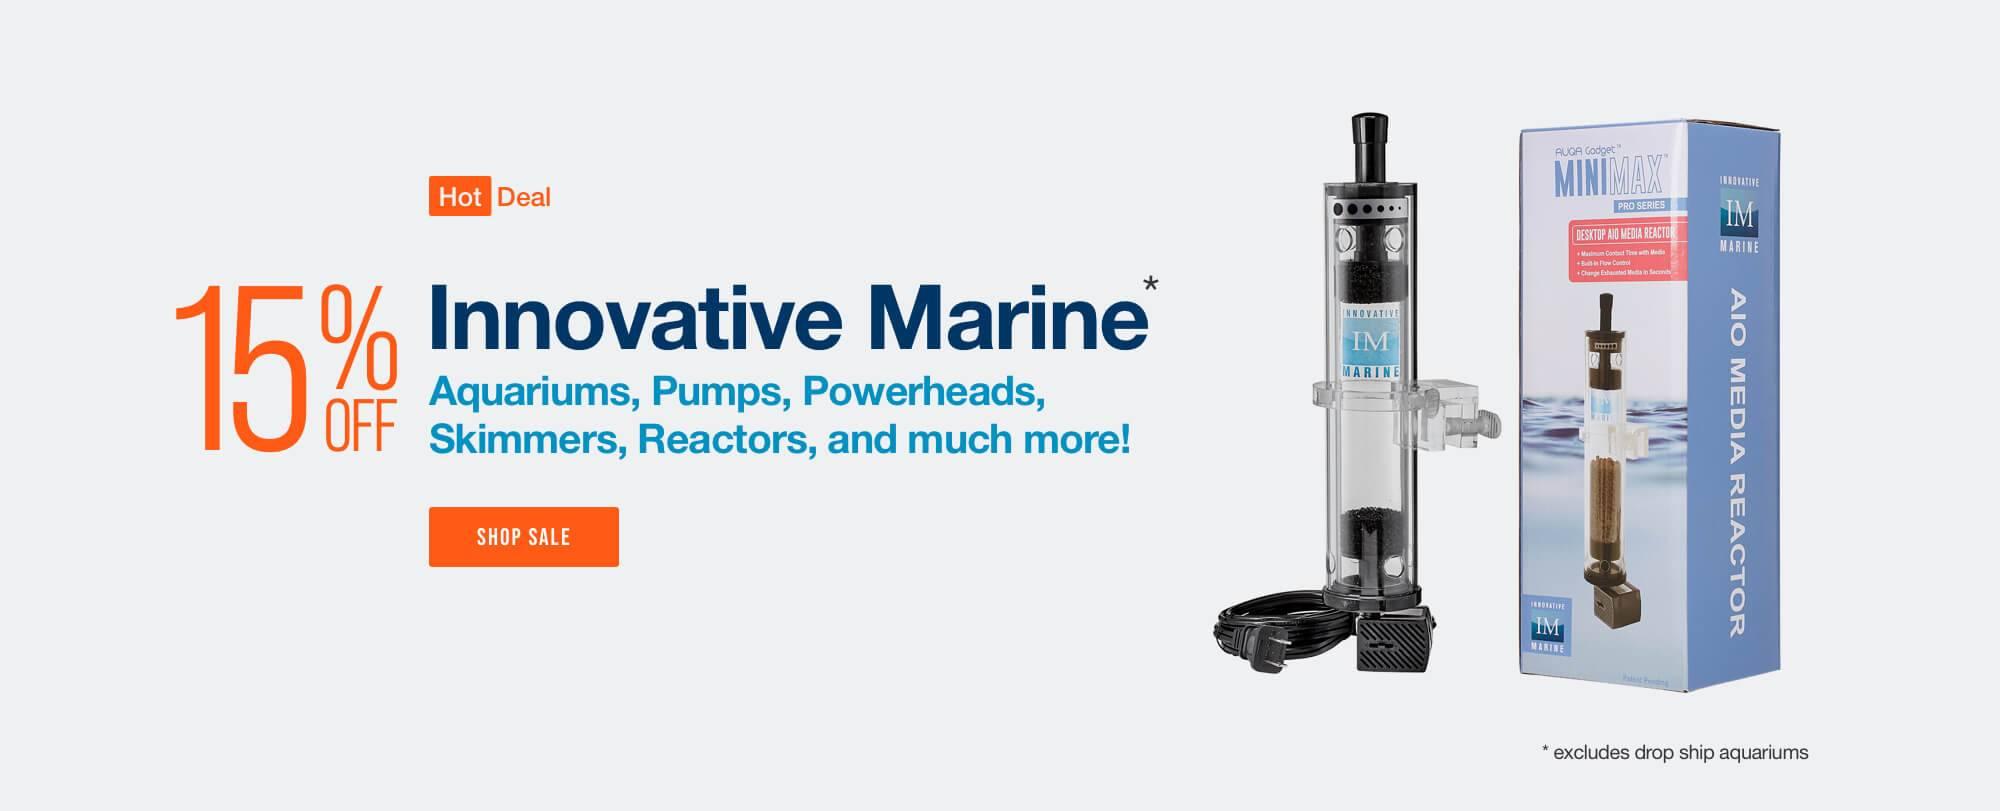 Save 15% off Innovative Marine (excludes drop ship) - Shop All Innovative Marine